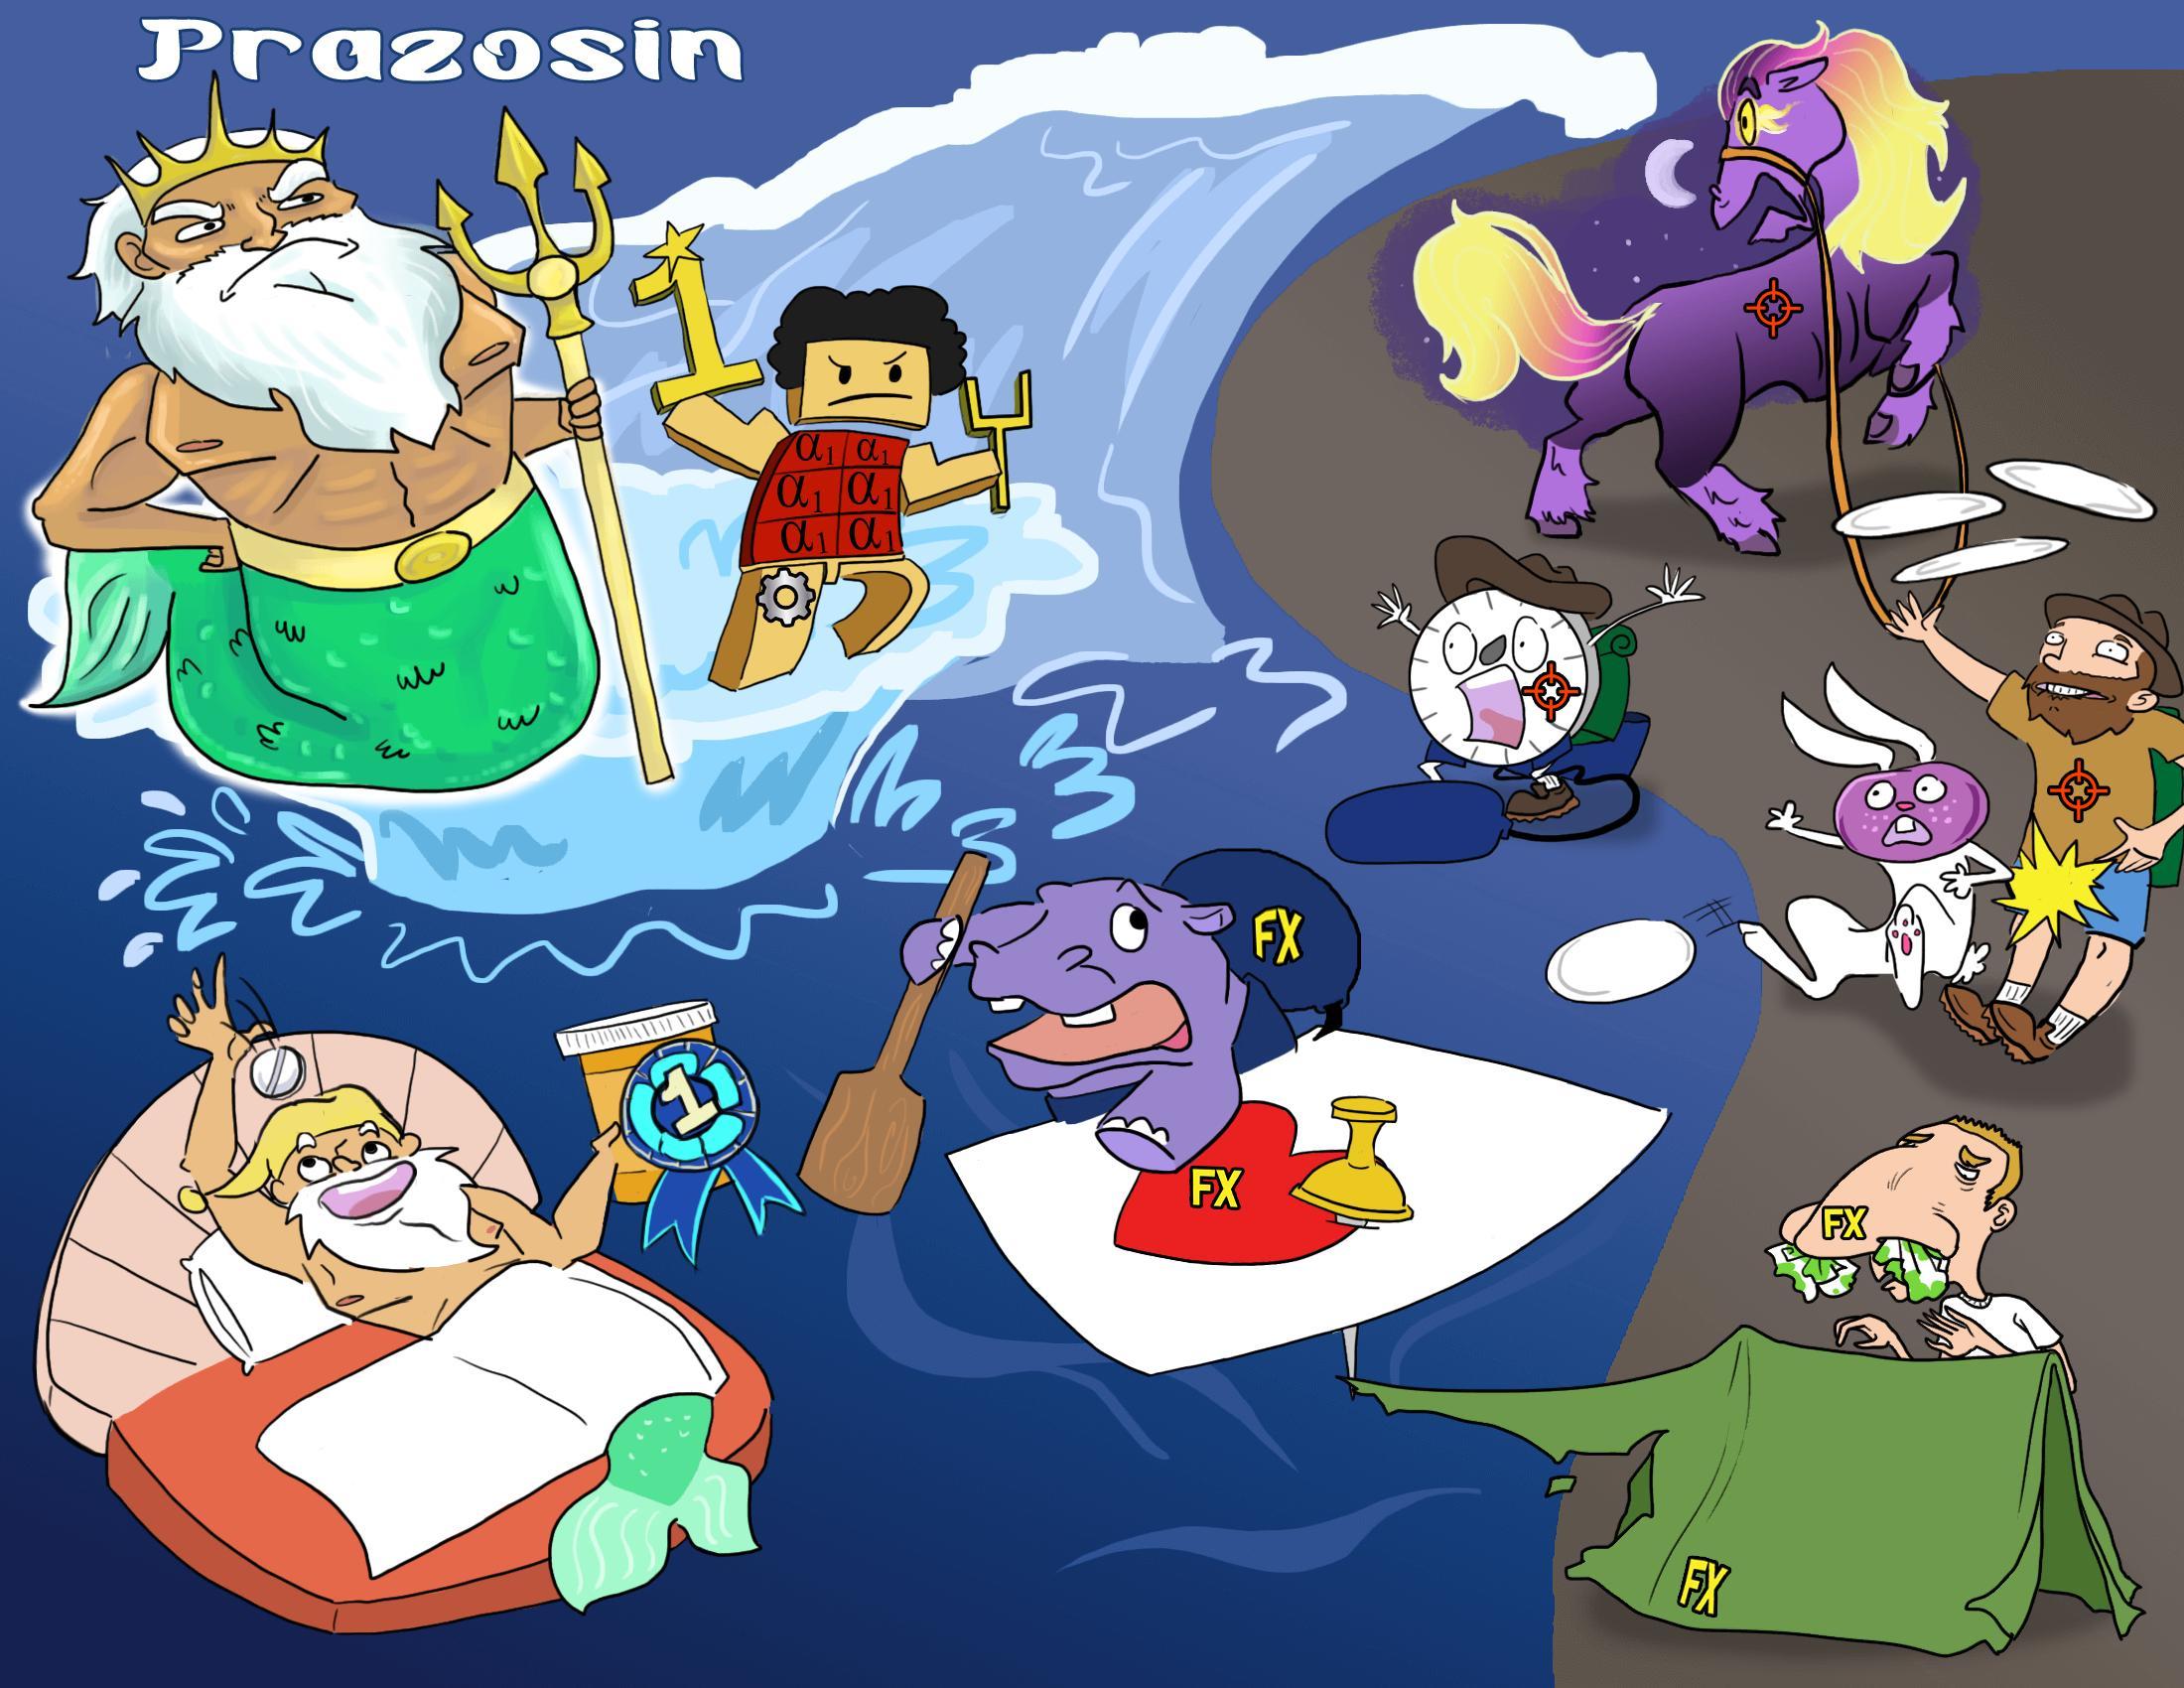 Prazosin (Minipress)